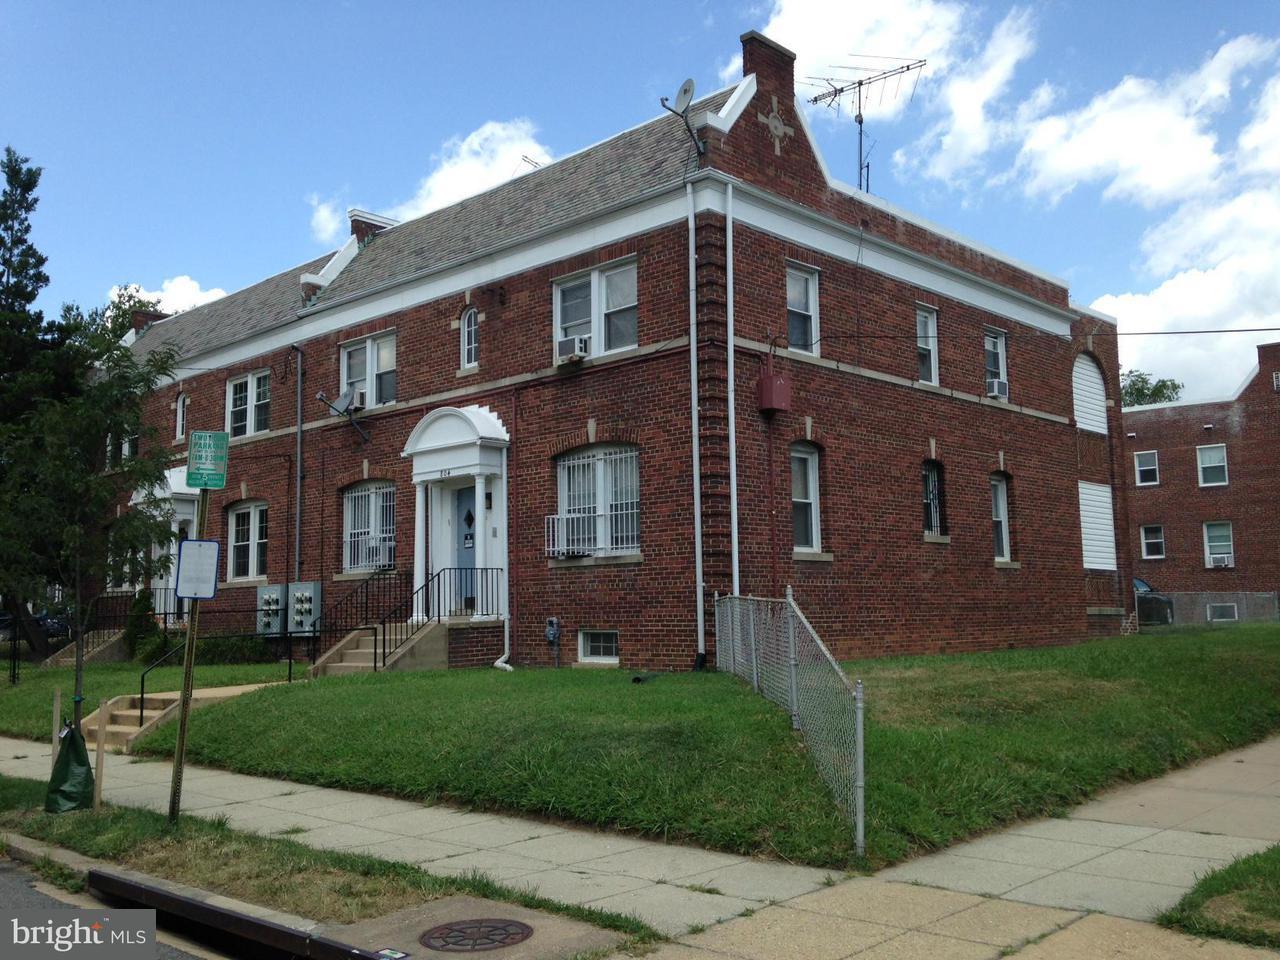 Casa Multifamiliar por un Venta en 804 RANDOLPH ST NE 804 RANDOLPH ST NE Washington, Distrito De Columbia 20017 Estados Unidos